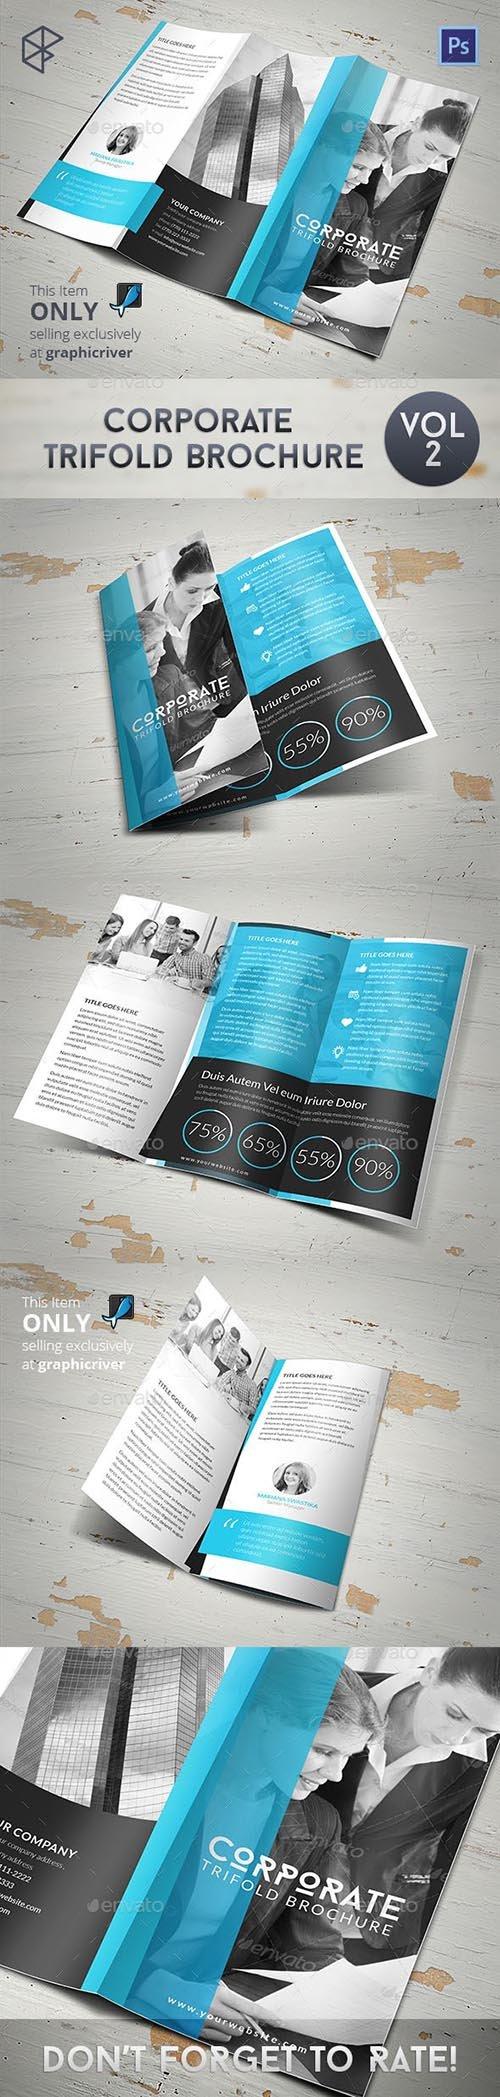 GR - Corporate Trifold Brochure Vol 2 8023555